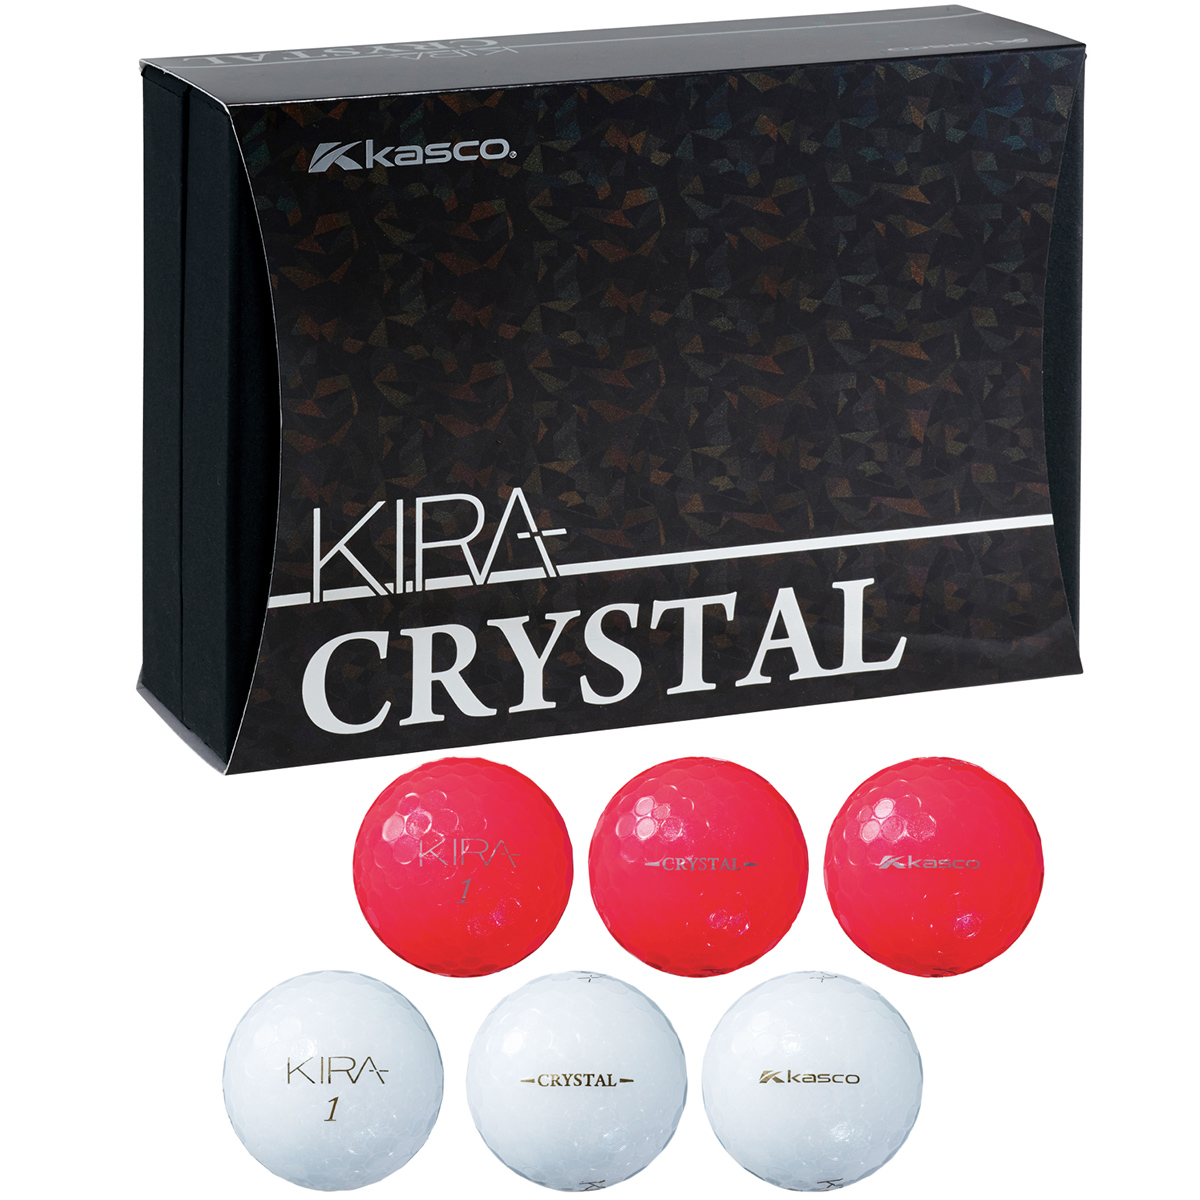 KIRA CRYSTAL 紅白ギフト ボール 6個入り